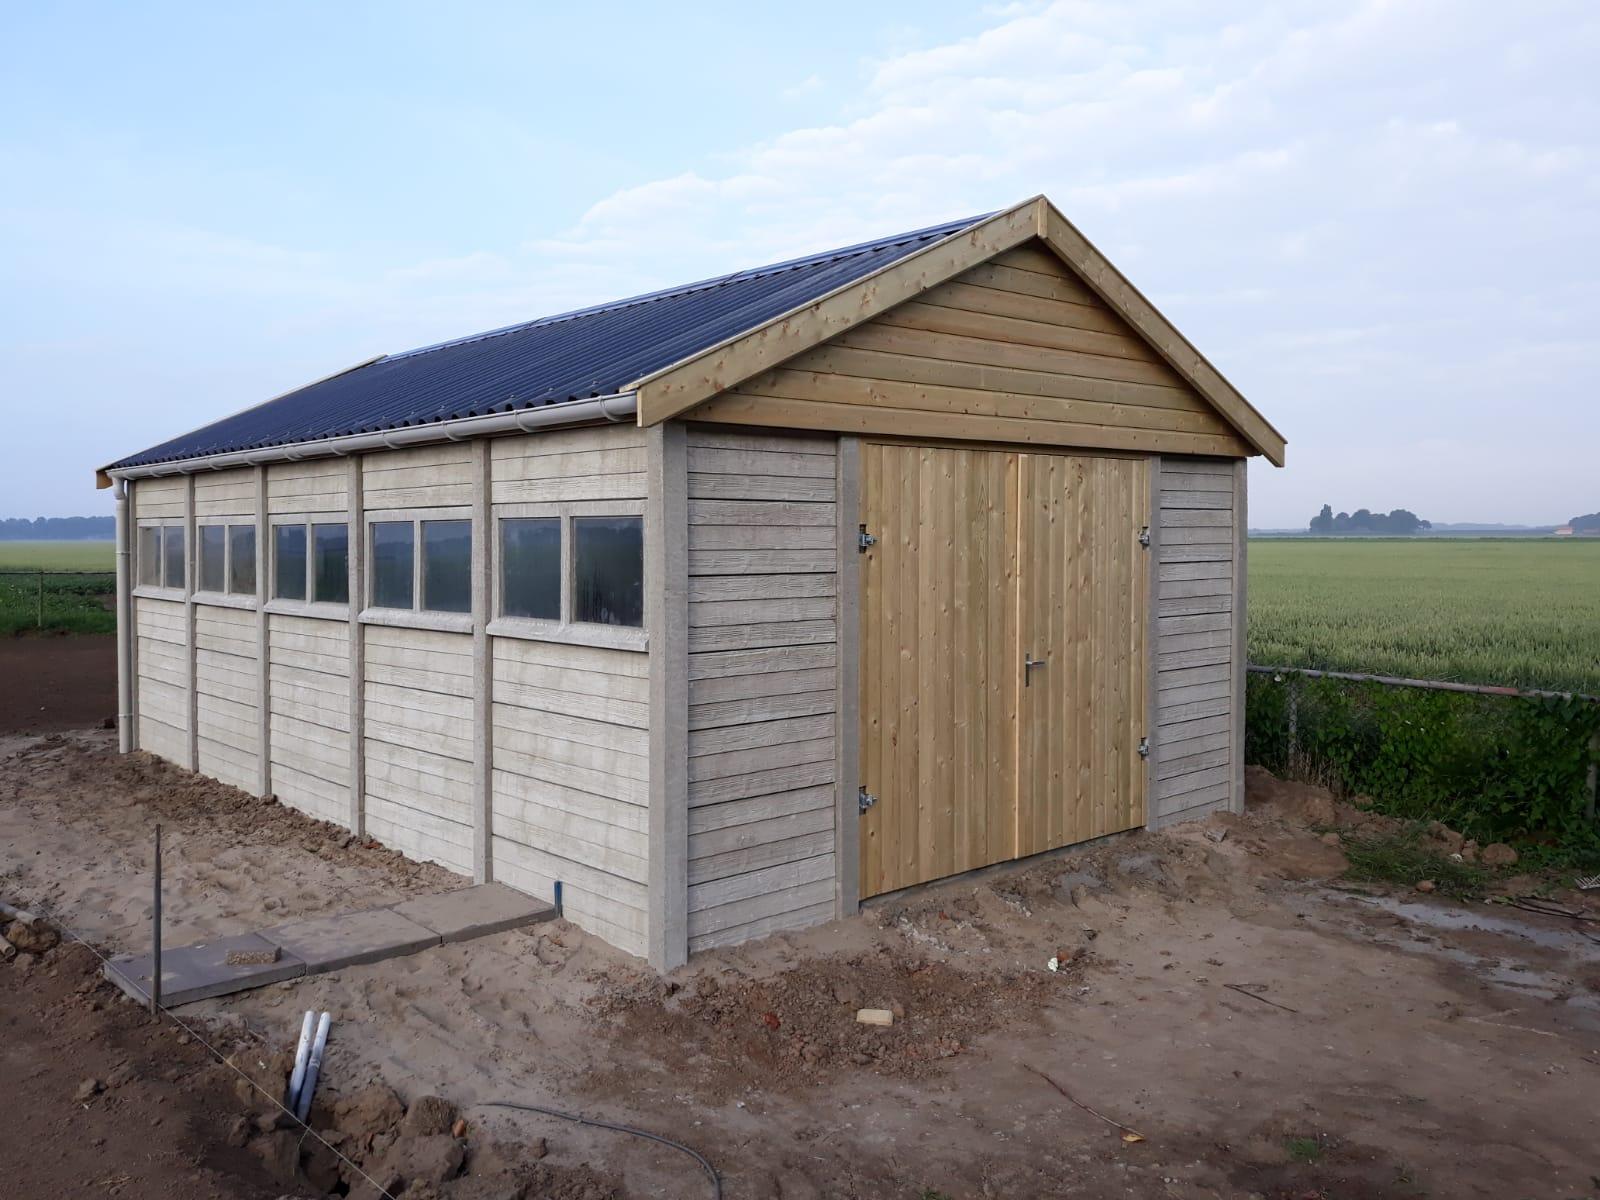 Prefab Garages Beton : Betonnen garage enkelzijdig beton systeembouw handvorm steenmotief